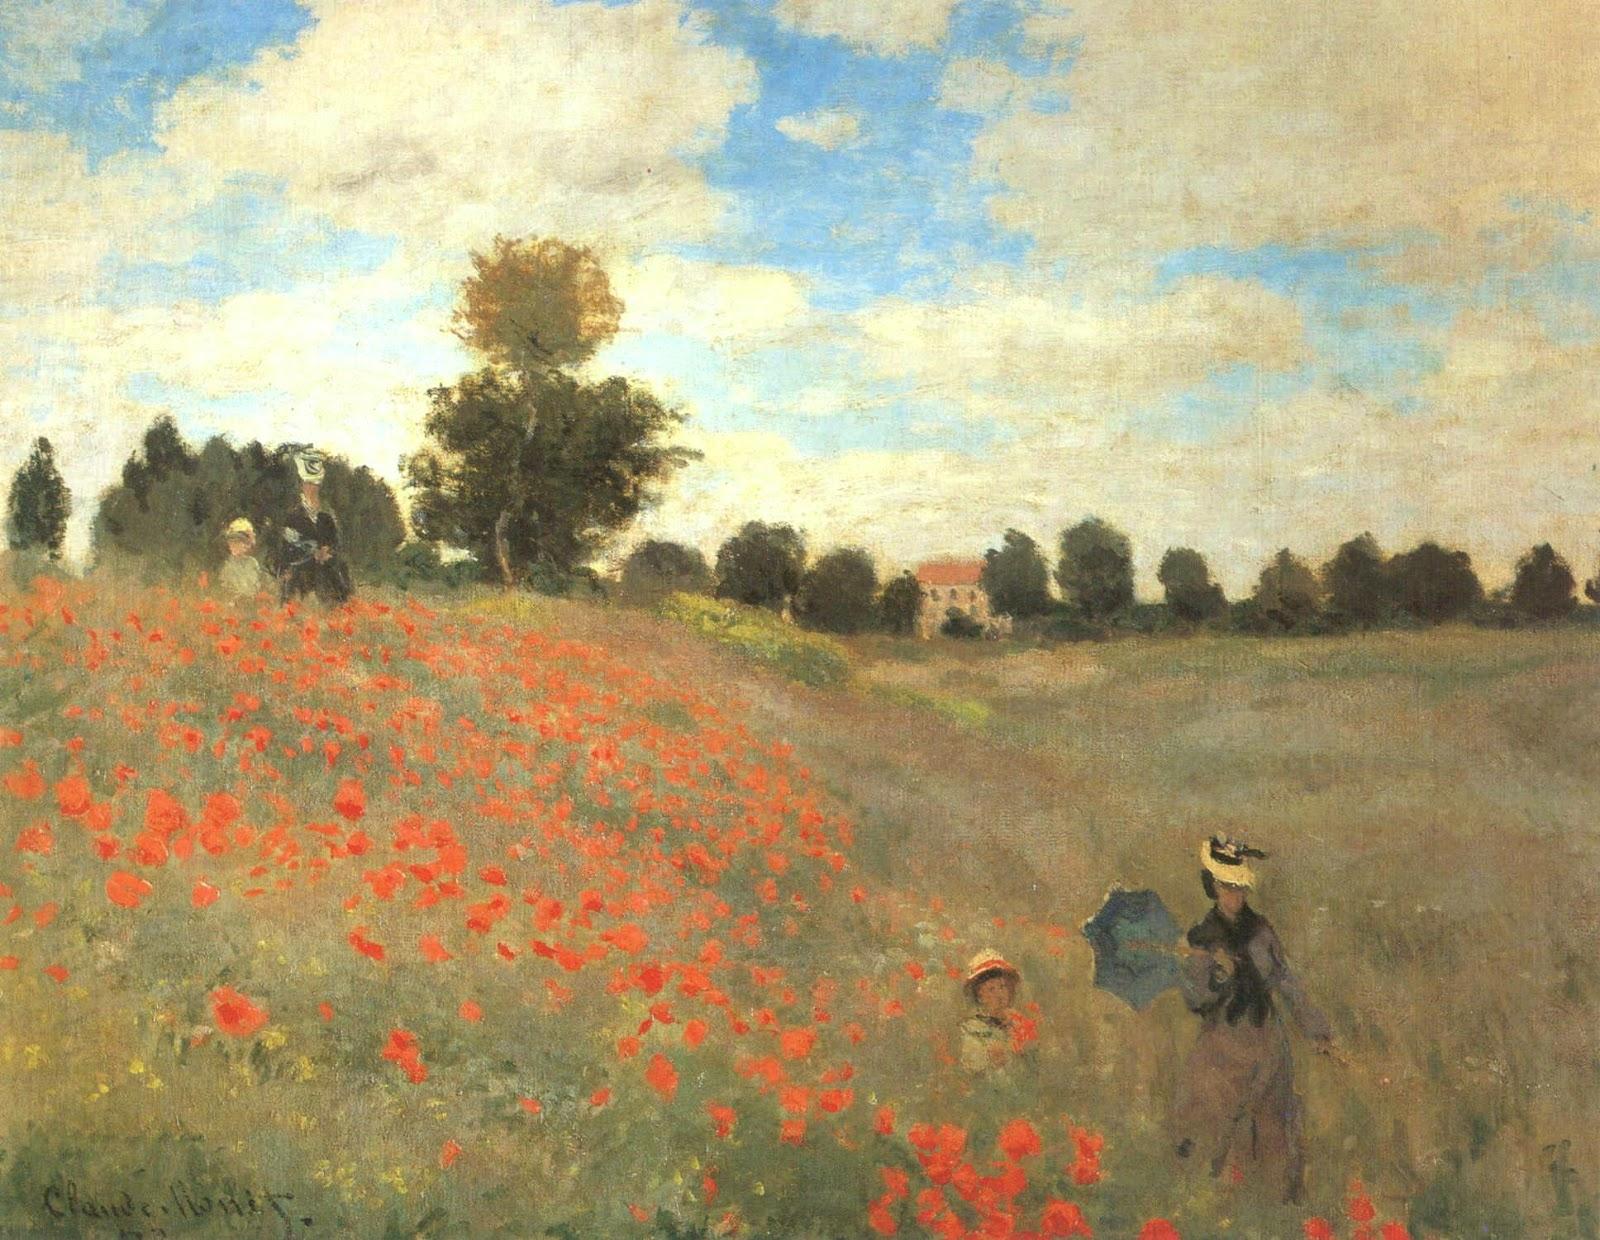 Claude monet impressionist plein air painter part 2 for Claude monet impressionist paintings